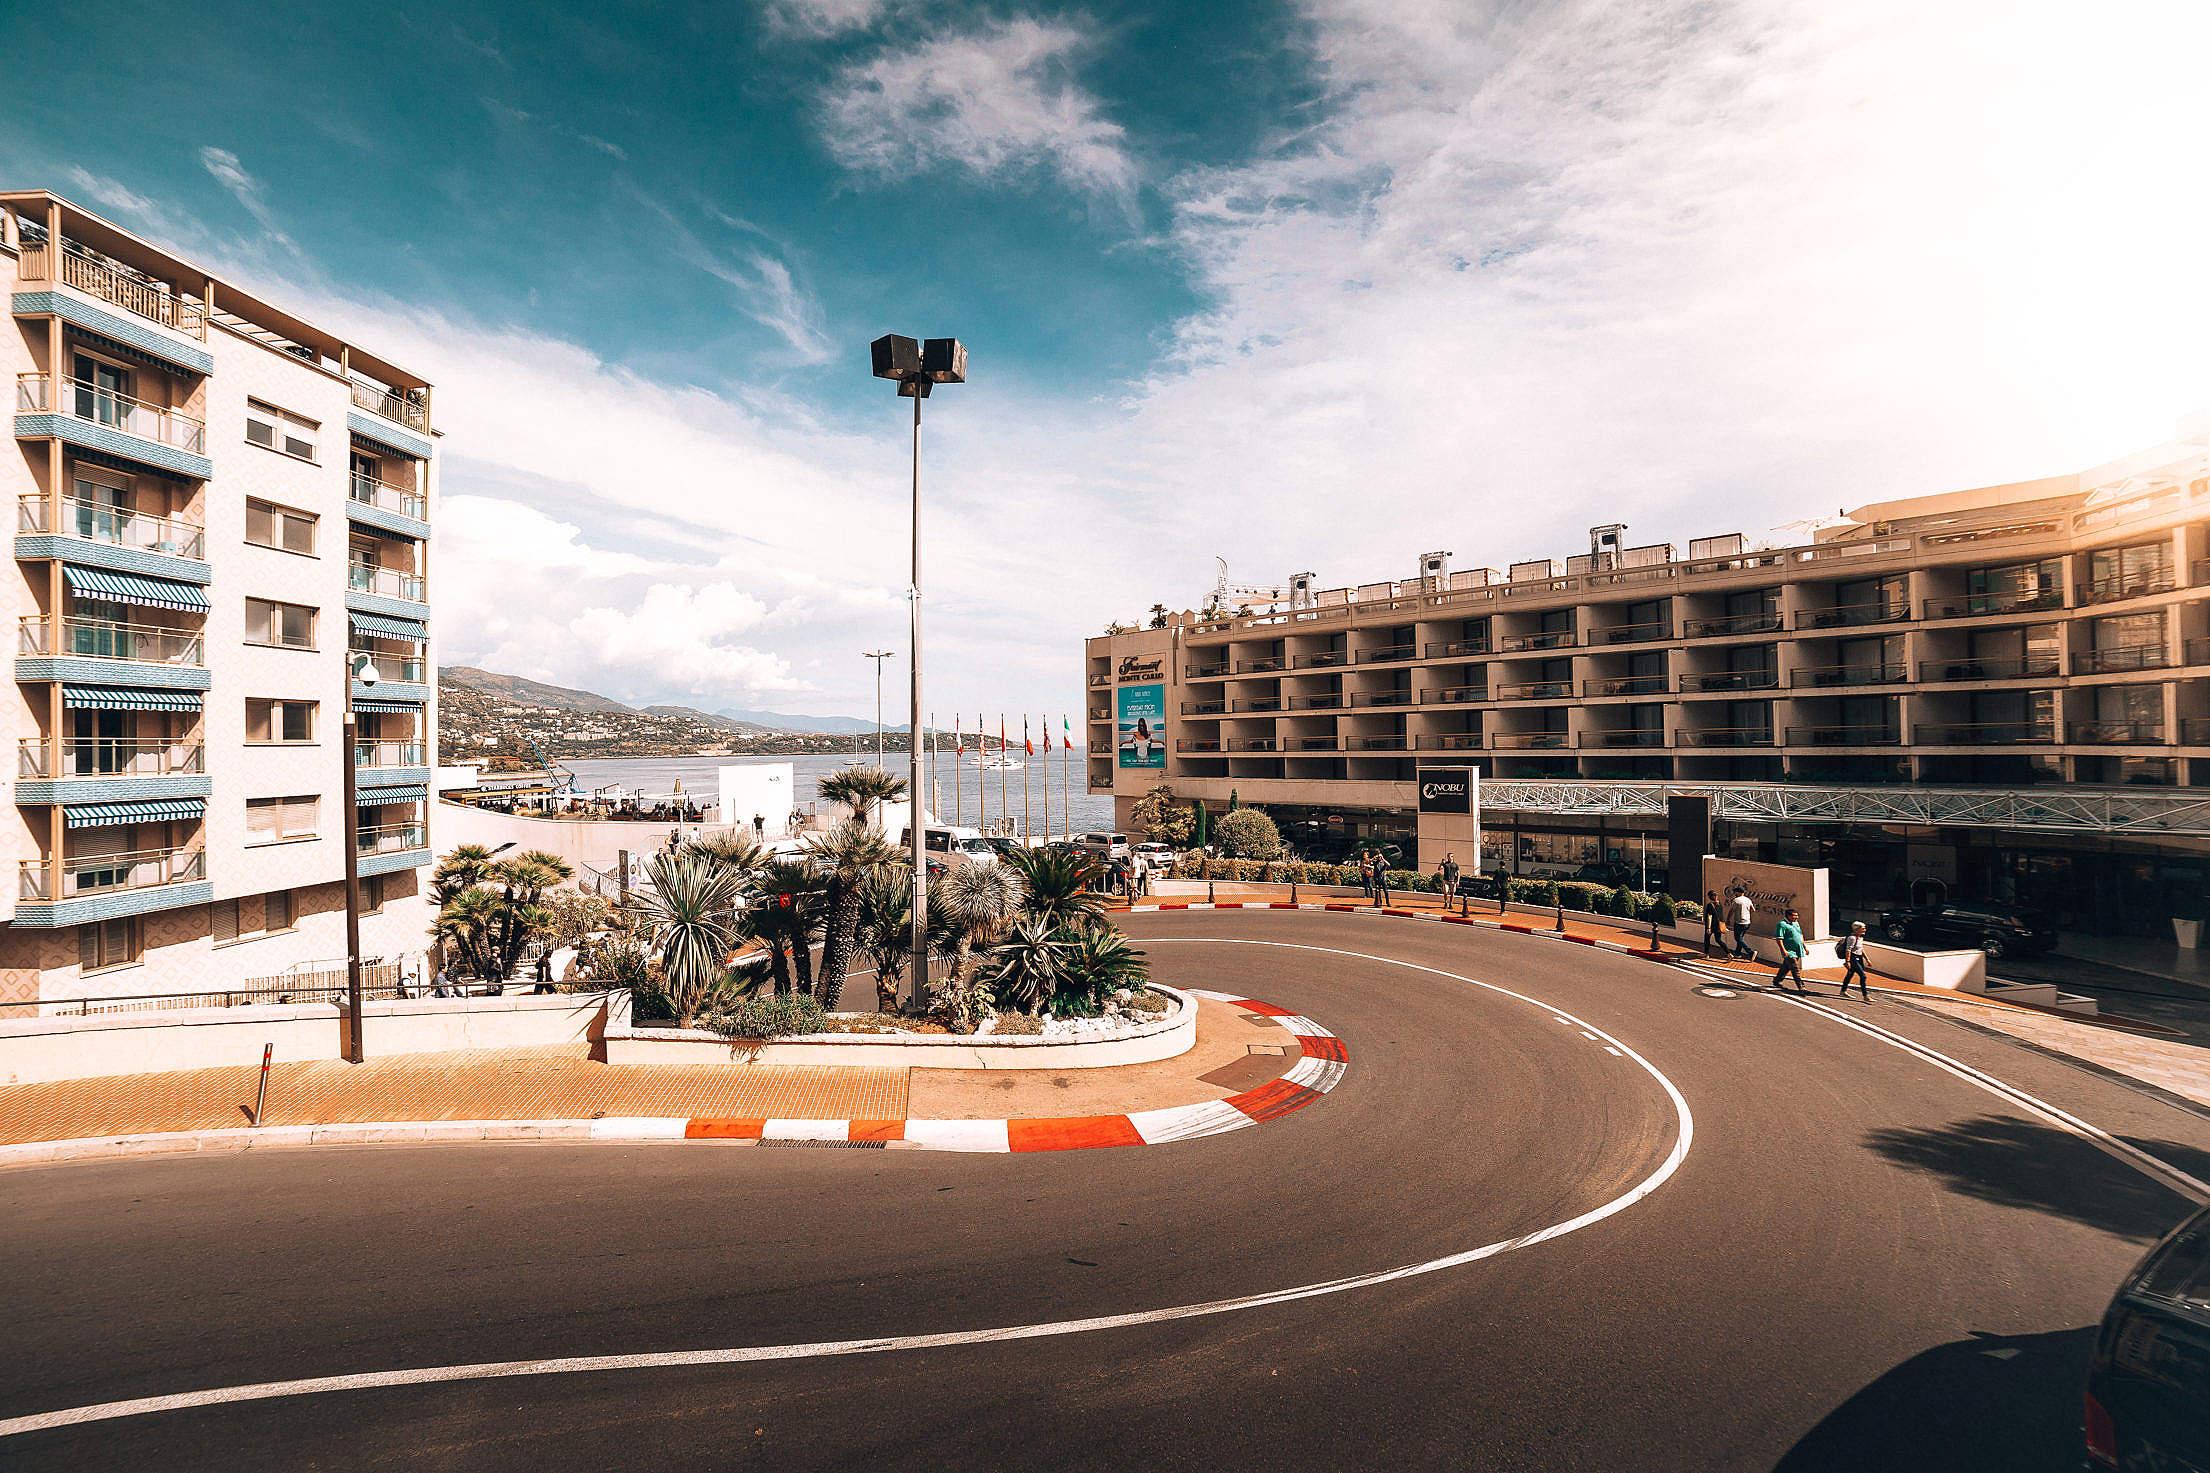 Famous F1 Turn in Monaco Free Stock Photo